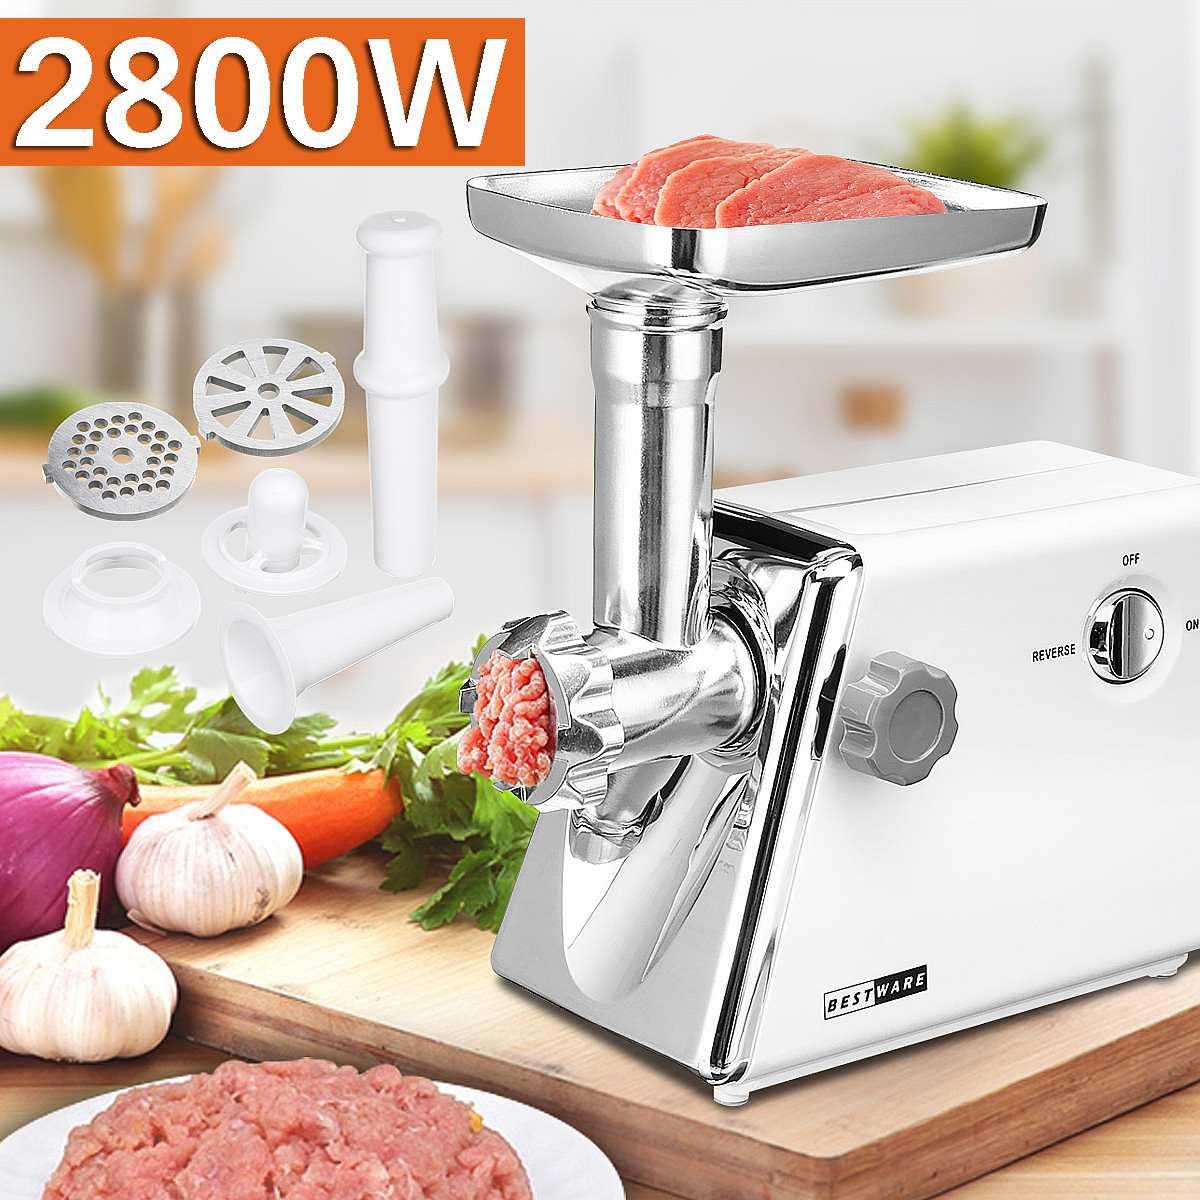 Multifunction 2800W 220V-240V Electric Meat Grinder Sausage Machine Mincer Kitchen Tool 15x34x33cm Three Grinding Plates